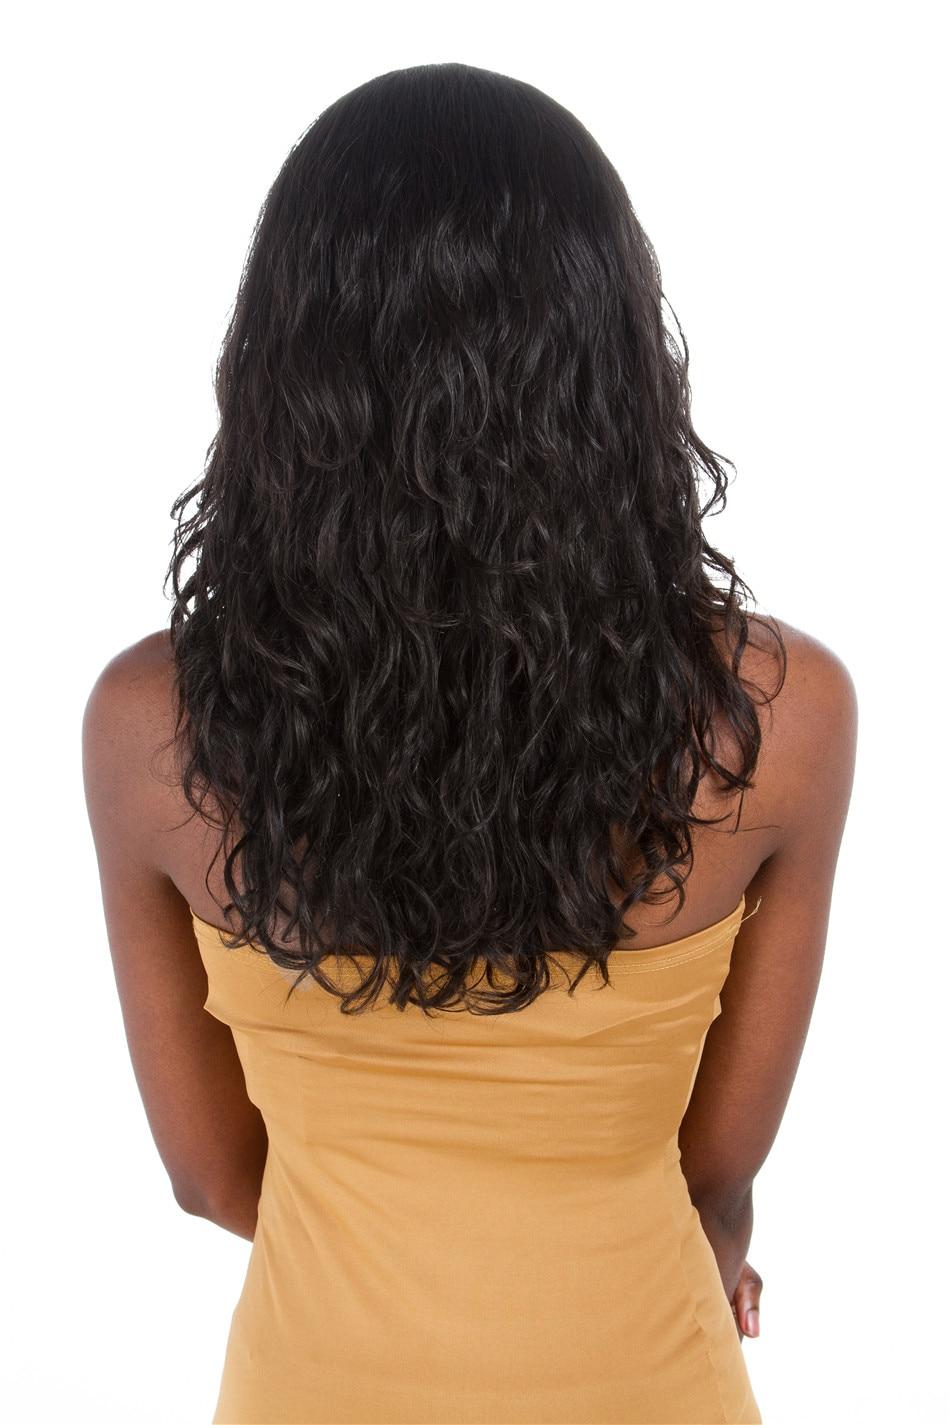 Queen Love μαλλιά βραζιλιάνα σώμα κορδόνι - Ομορφιά και υγεία - Φωτογραφία 2